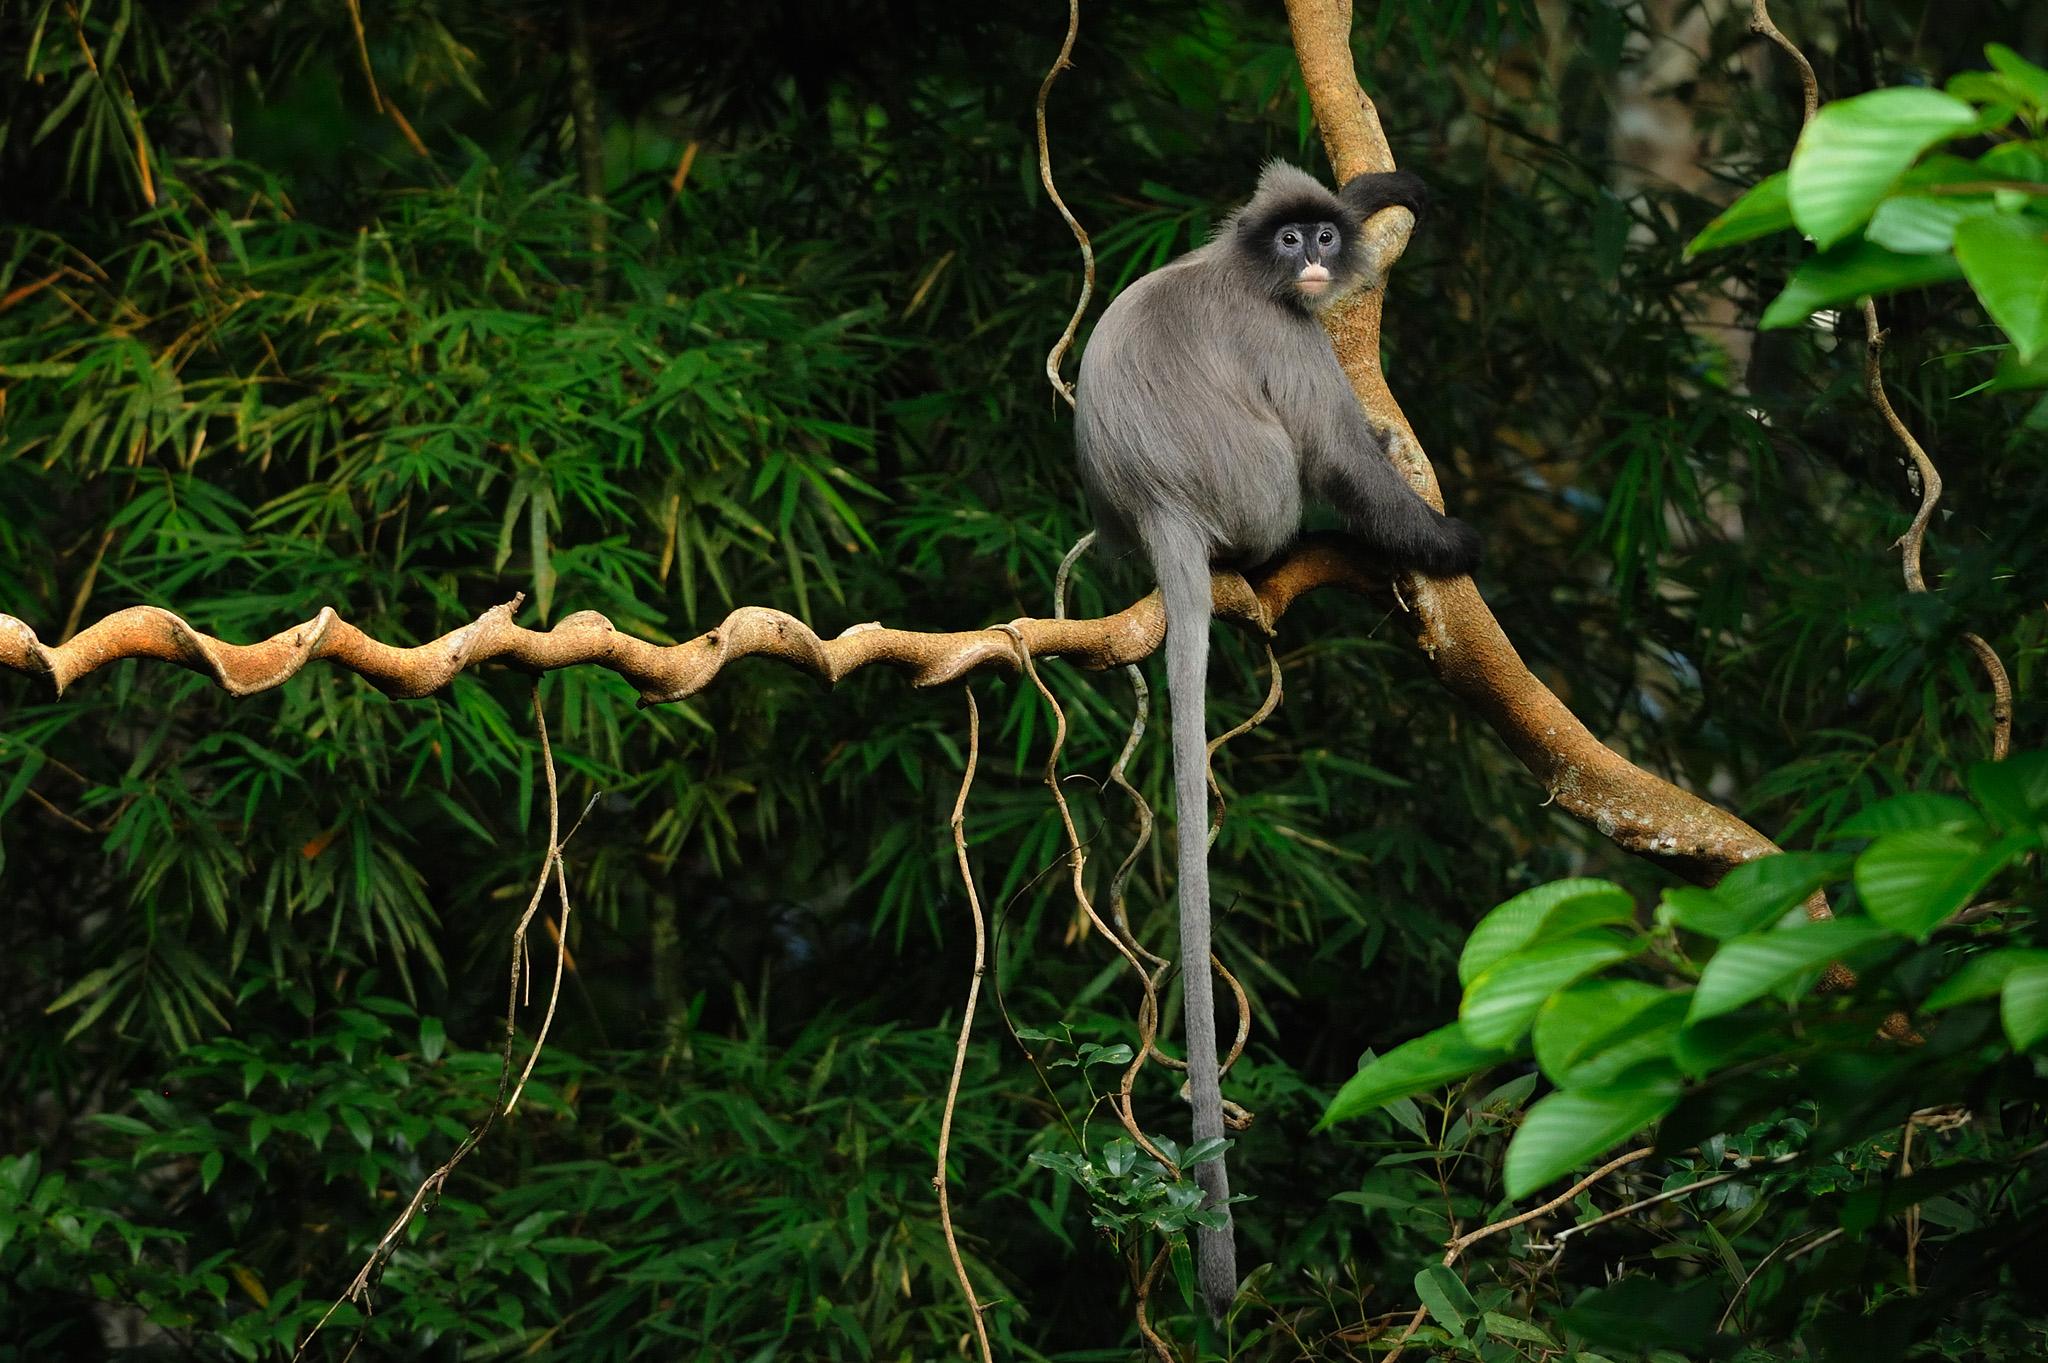 Phayre's Langur also known as Phayre's Leaf Monkey, Trachypithecus phayrei in Phu Khieo Wildlife Sanctuary, Thailand. Flickr - tontantravel.